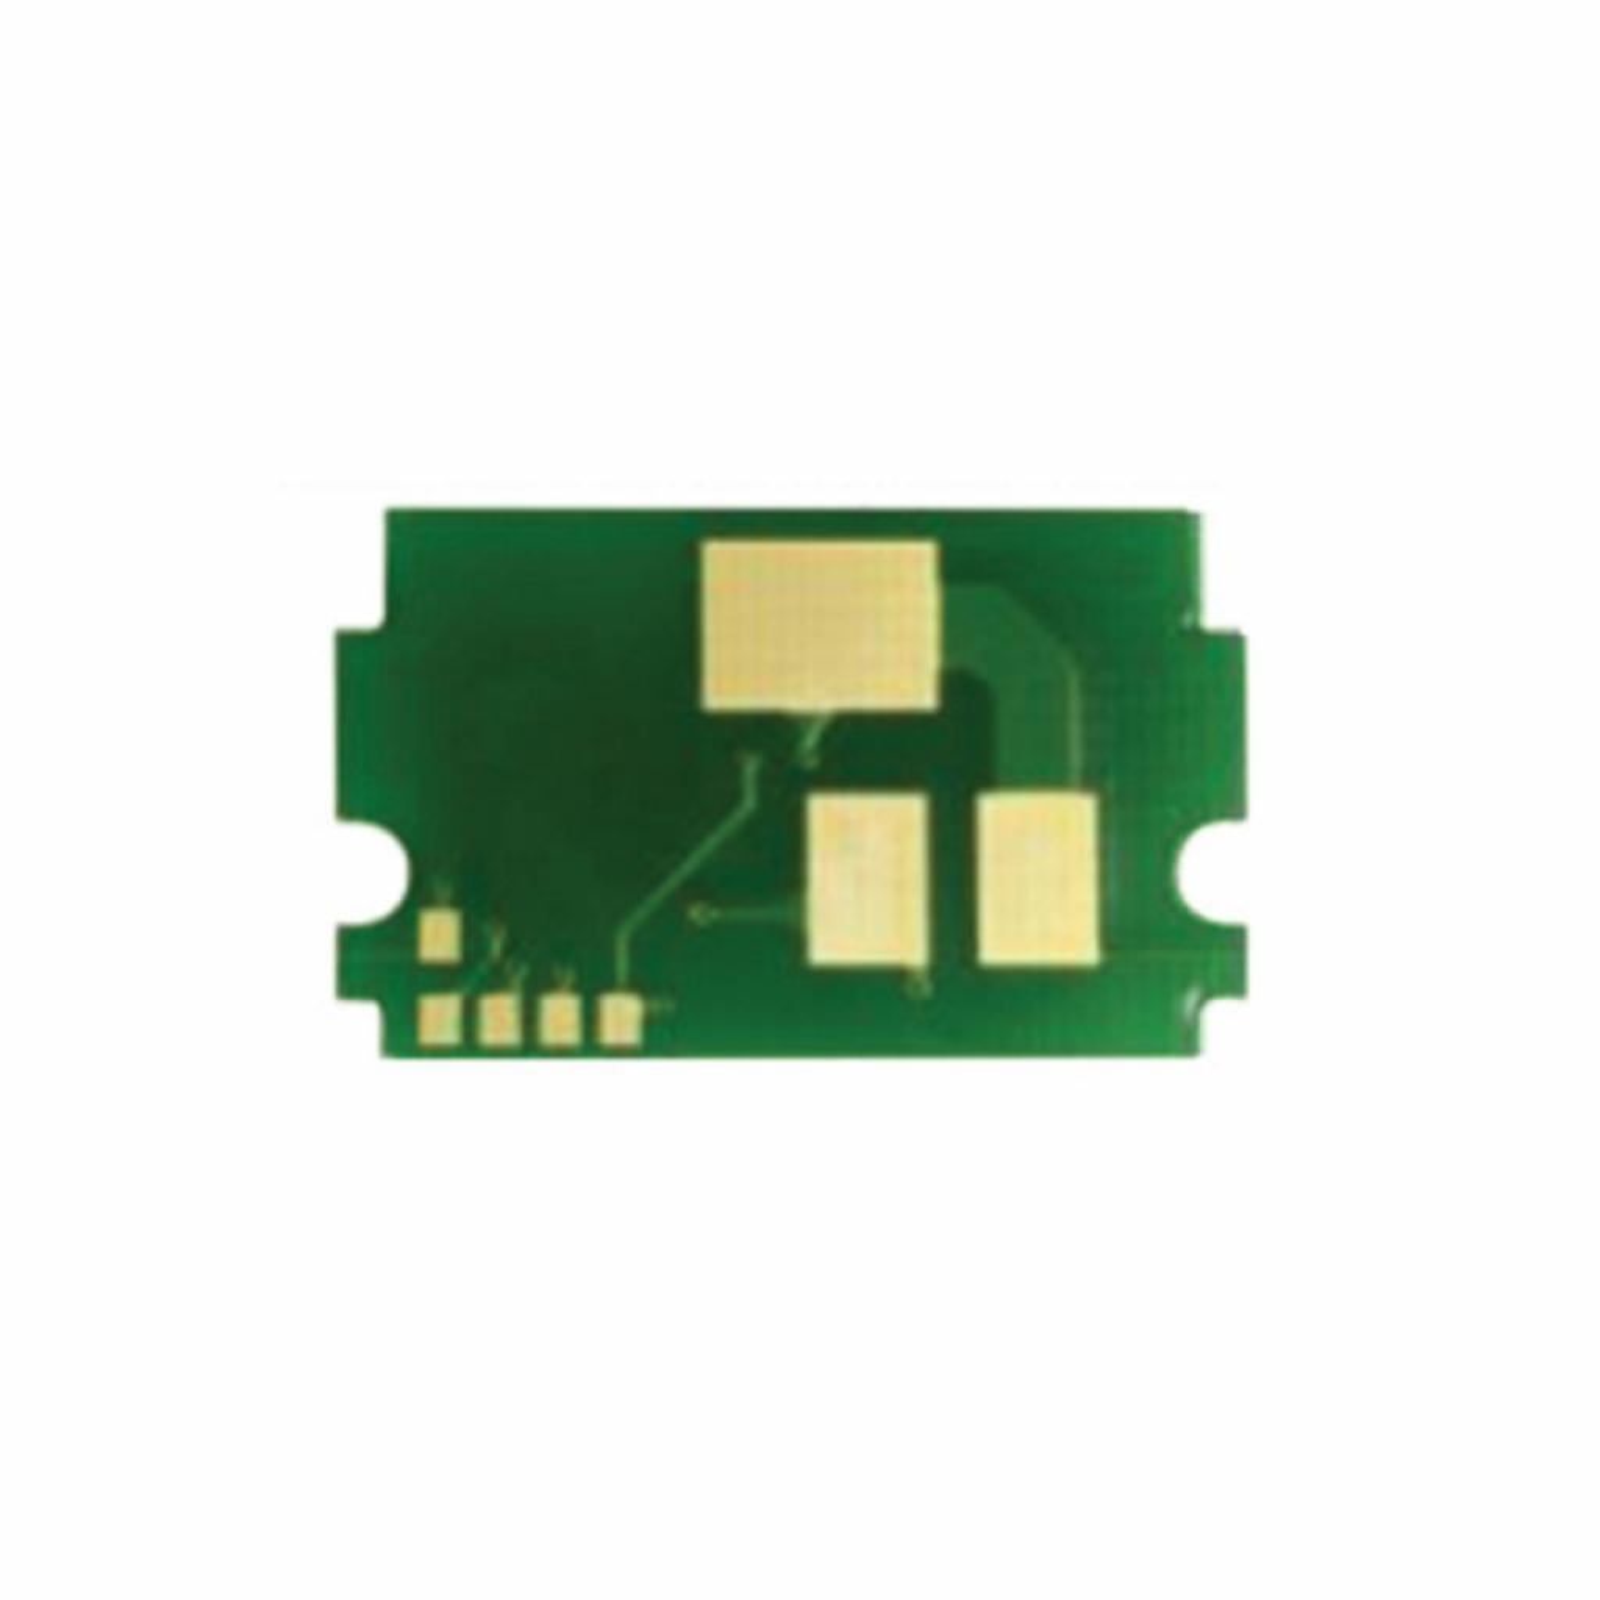 Чип для картриджа Kyocera TK-5220M 1.2k magenta Static Control (TK5220CP-MAEU)